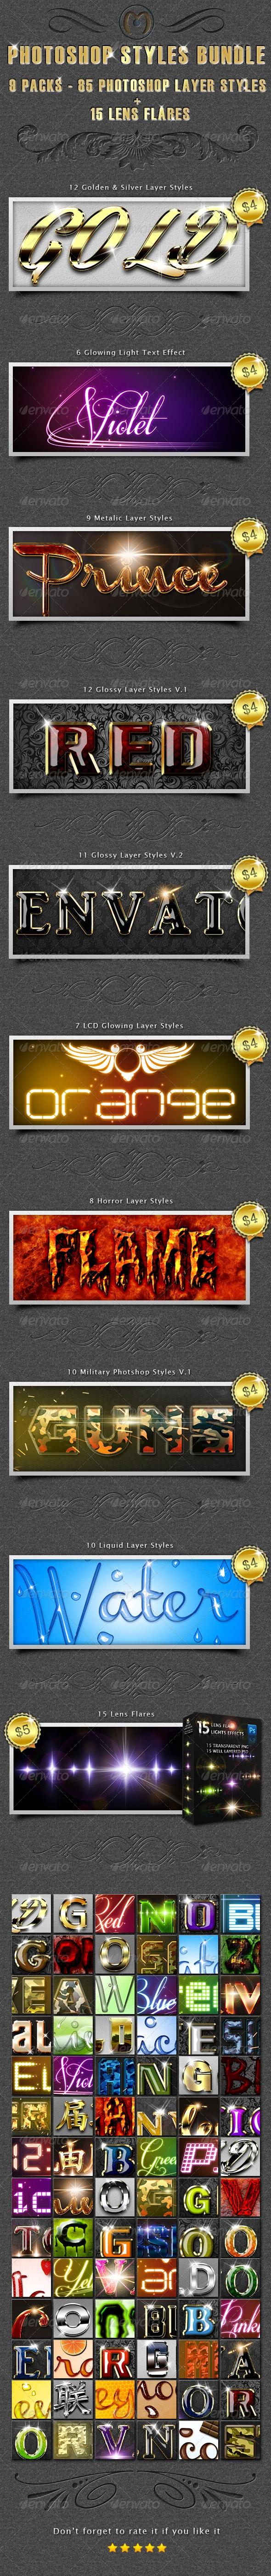 85 Photoshop Styles Bundle - Text Effects Styles